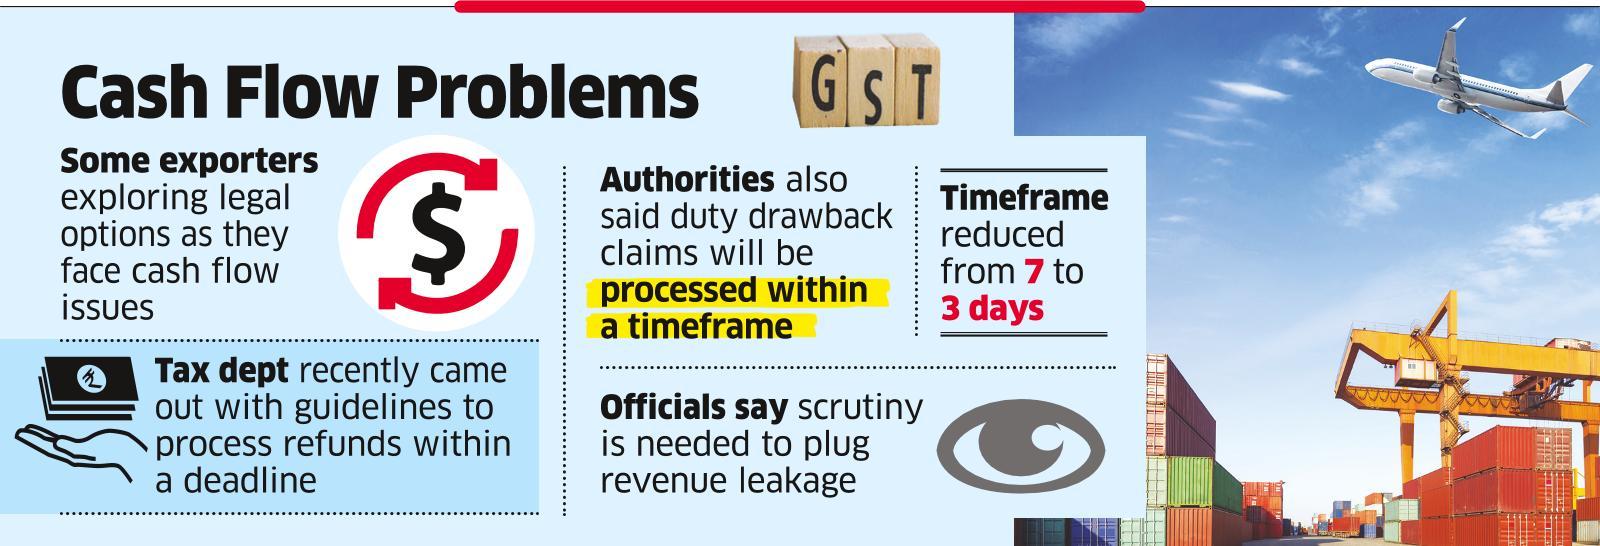 Exporters Complain of Delay in GST Refunds Despite Govt Timeframe